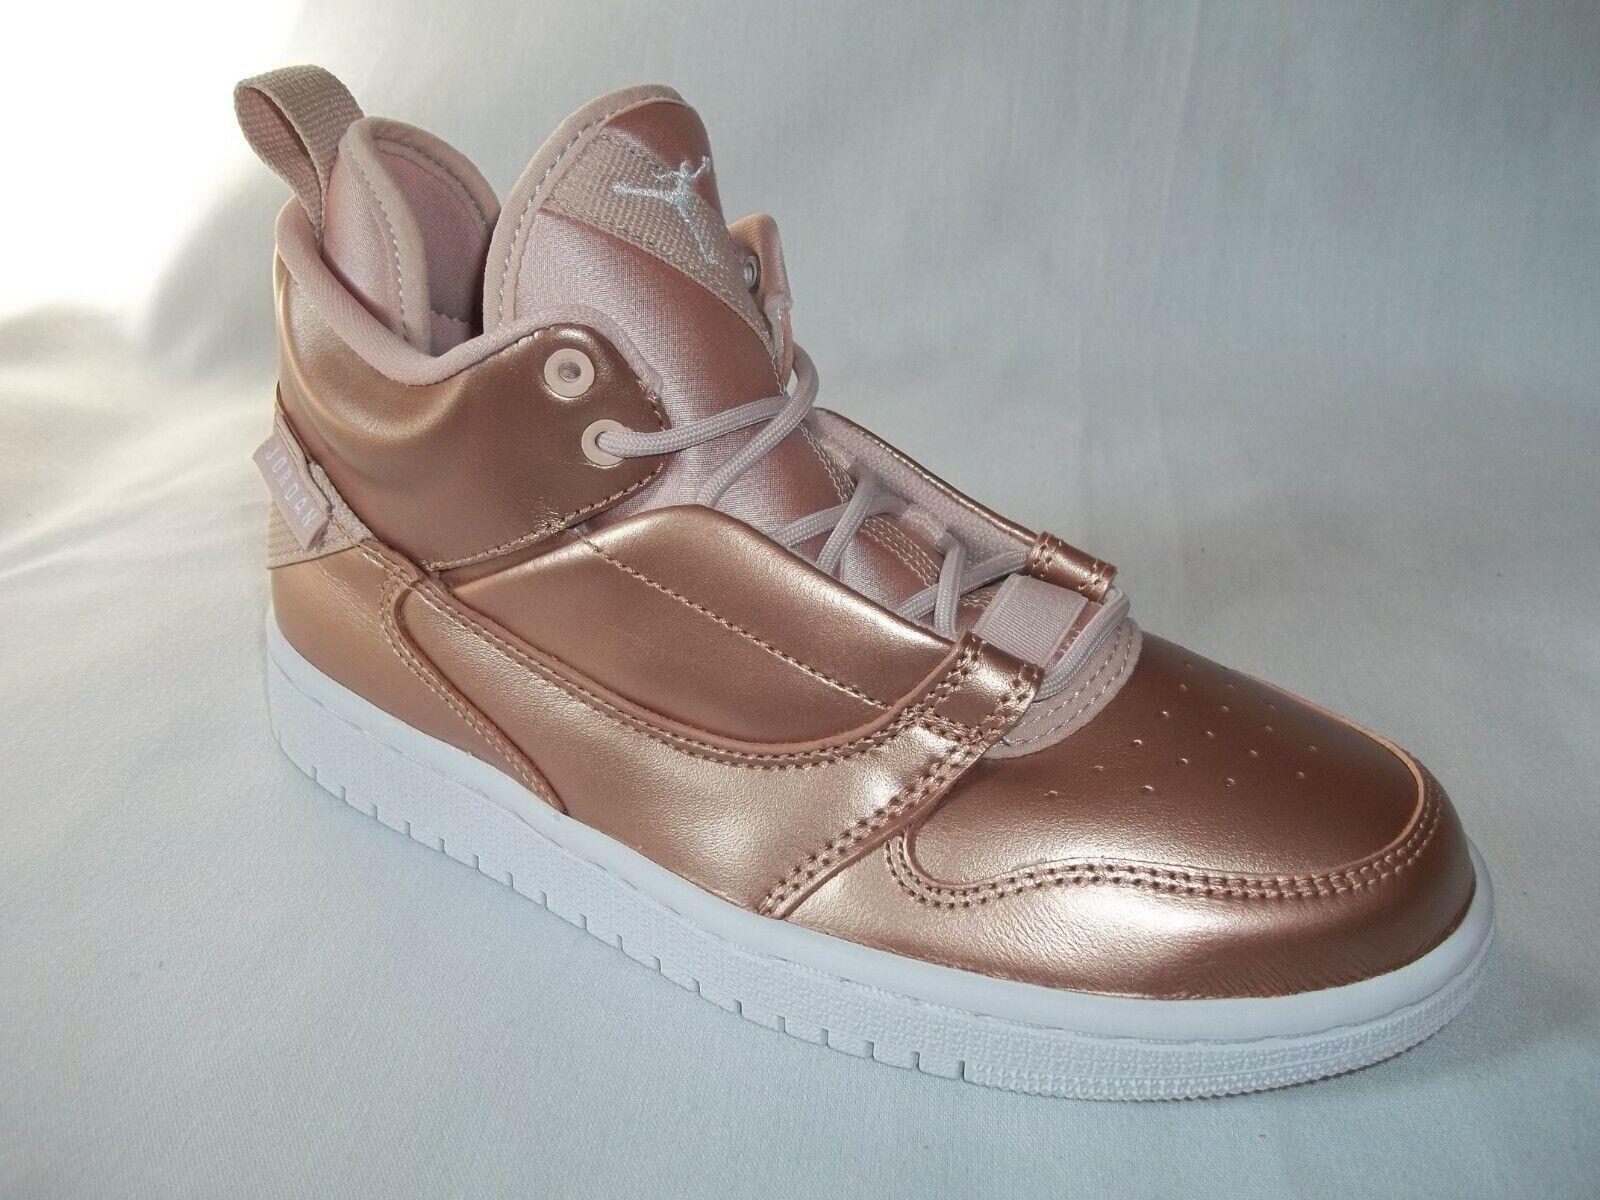 Jordan Fade Away   SE GS  shoes SZ 5.5- Beige White- AV5181 240  with 60% off discount